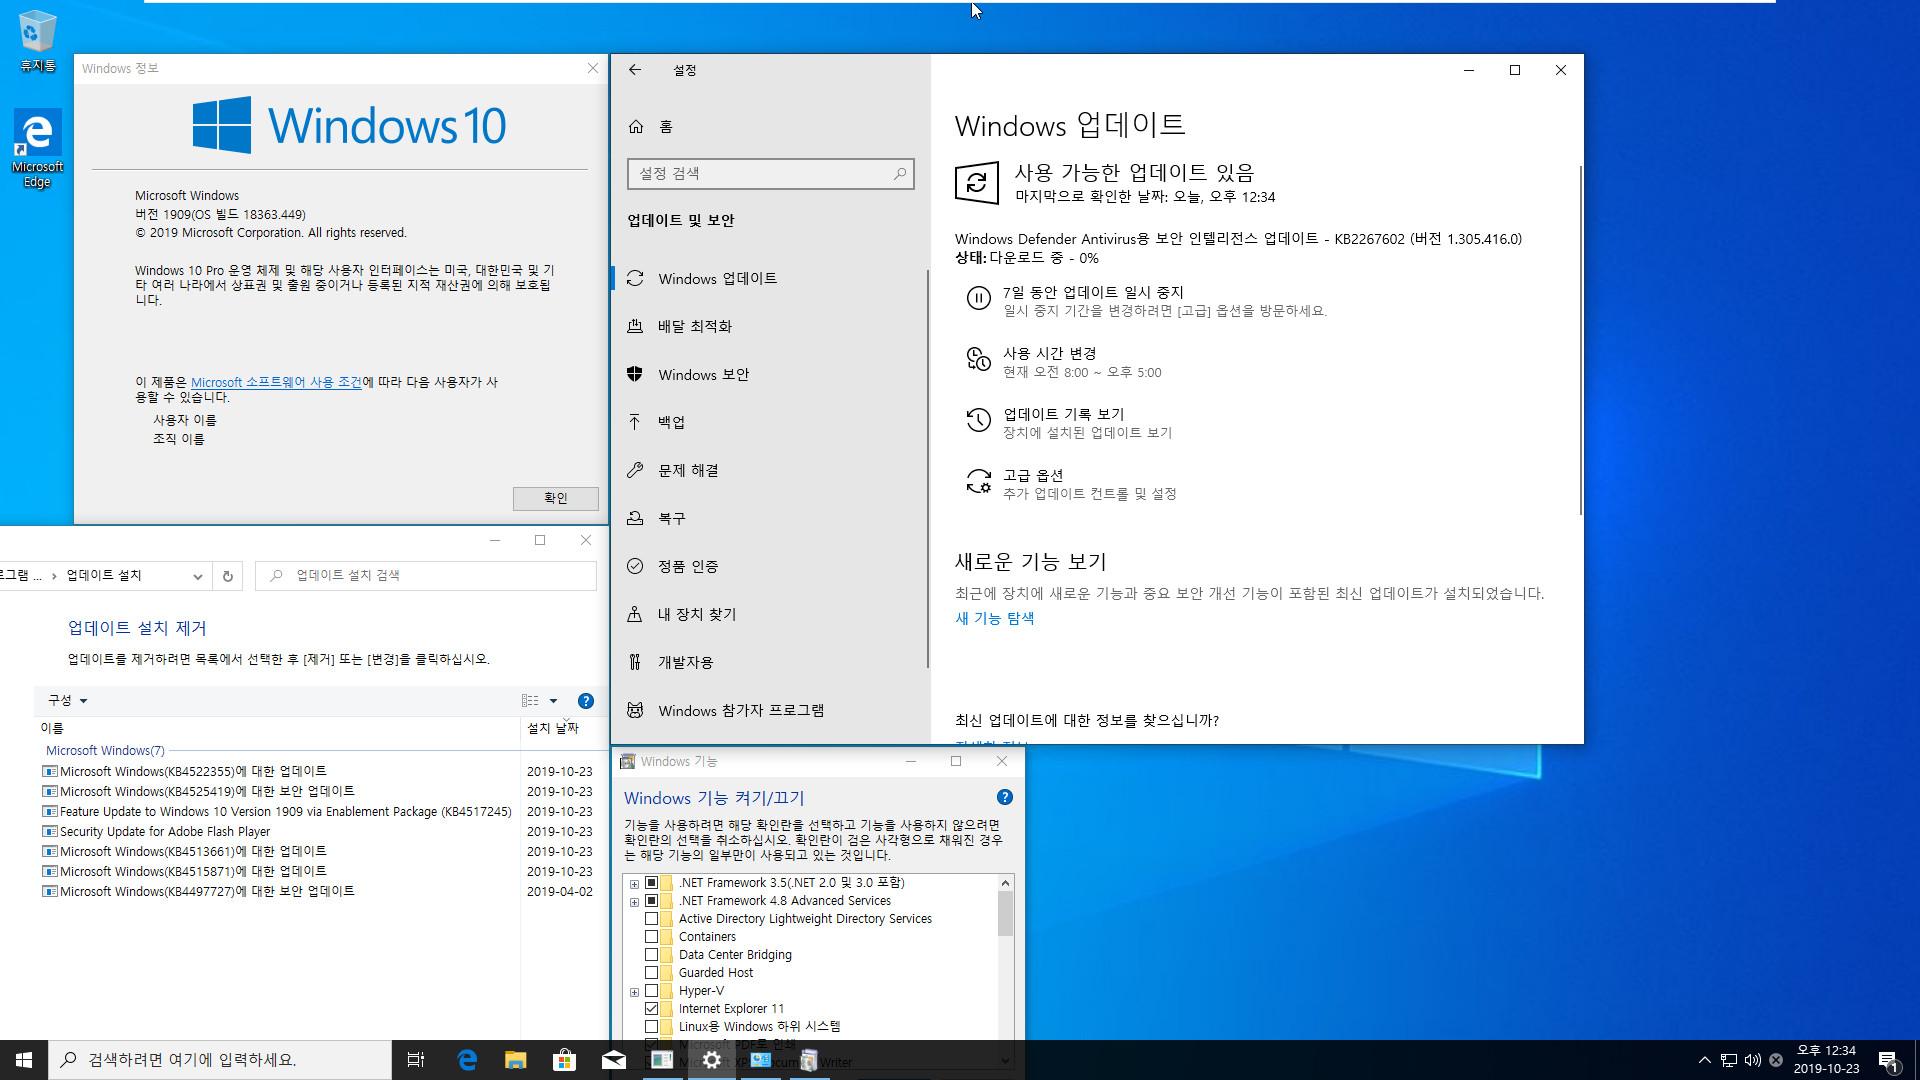 Windows 10 버전 1909 누적 업데이트 KB4522355 (OS 빌드 18363.449) [2019-10-22 일자] [릴리스 프리뷰] 나왔네요 - 19H2와 19H1을 함께 프로 64비트 install.wim 통합합니다. [최초기록, 예약된 저장소 삭제 적용] 2019-10-23_123417.jpg